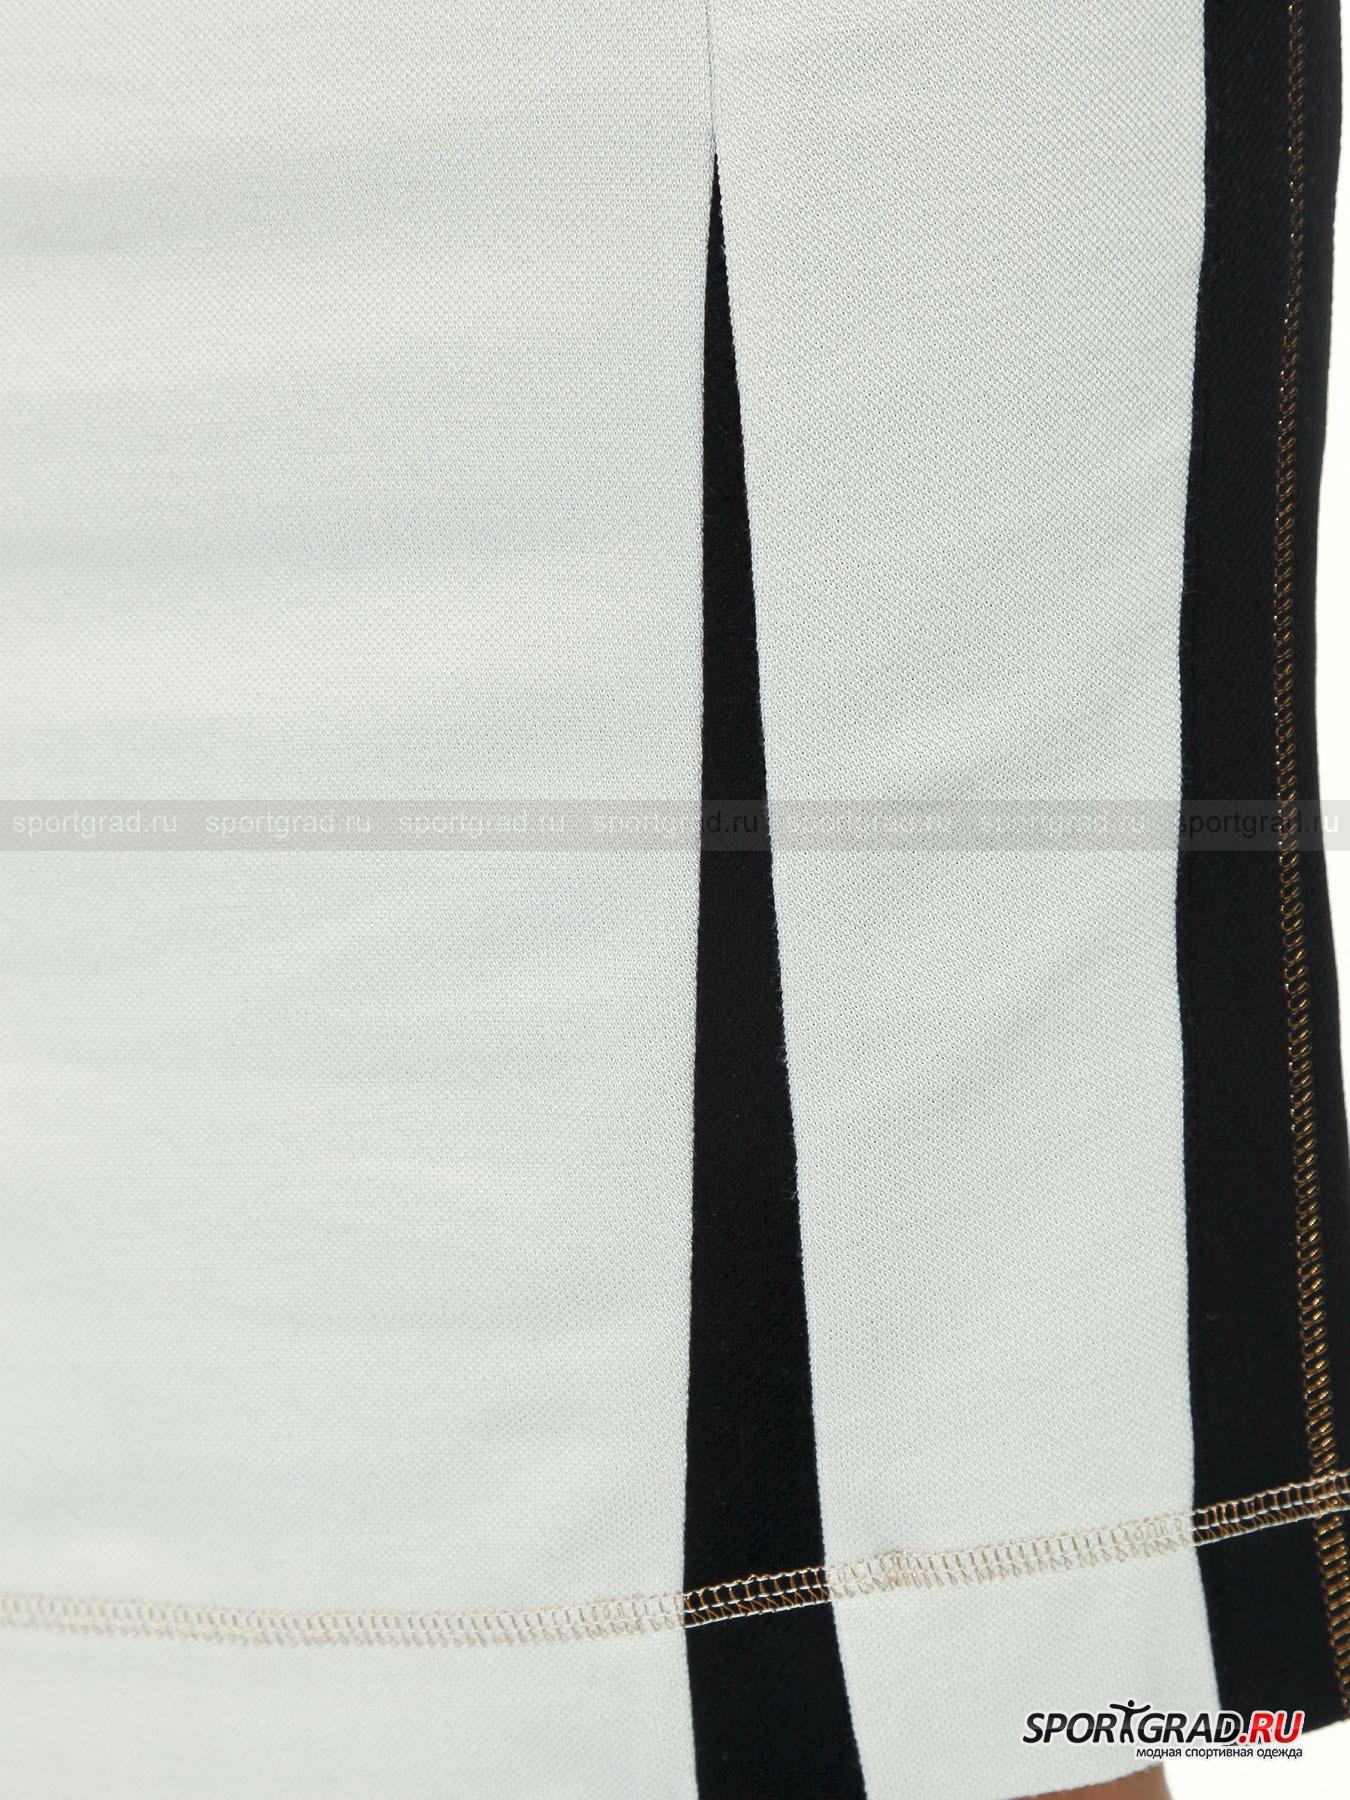 Юбка-карандаш женская Glow SPORTALM на подкладке от Спортград